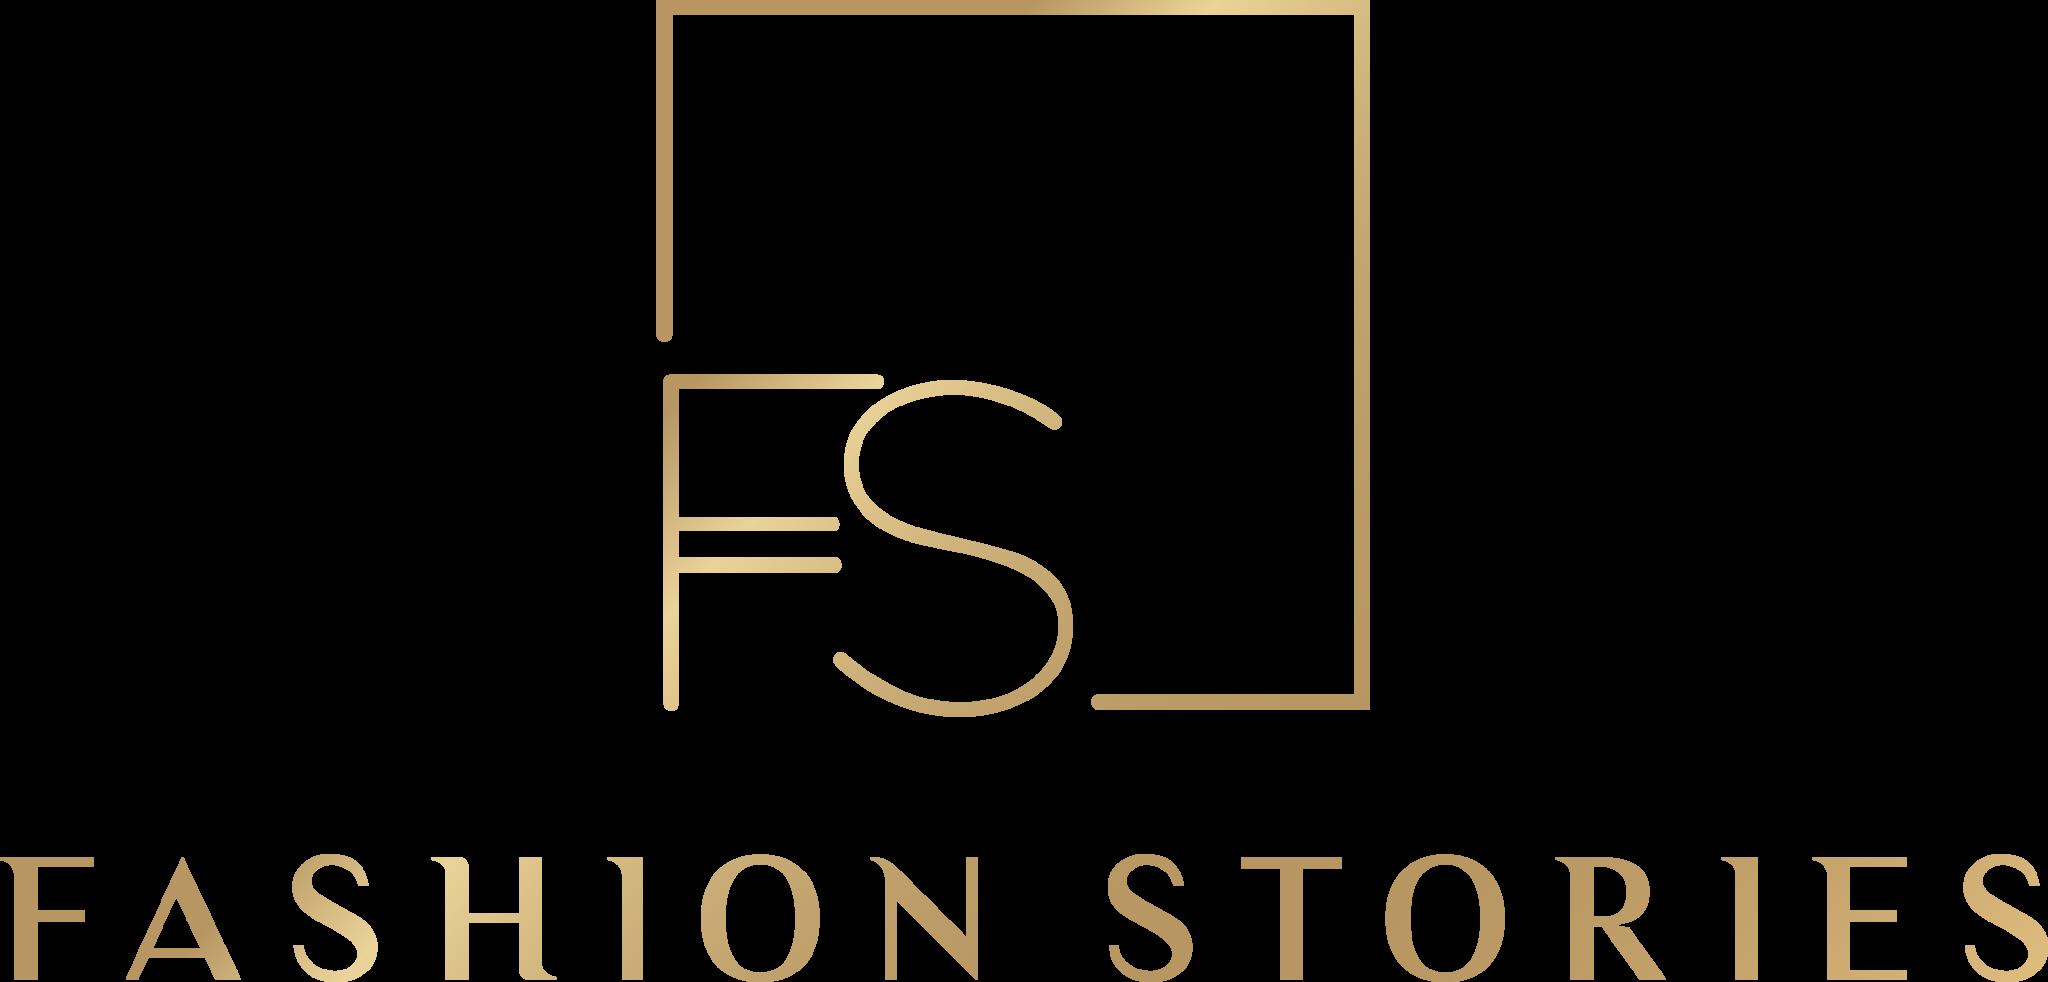 Fashionstories.nu